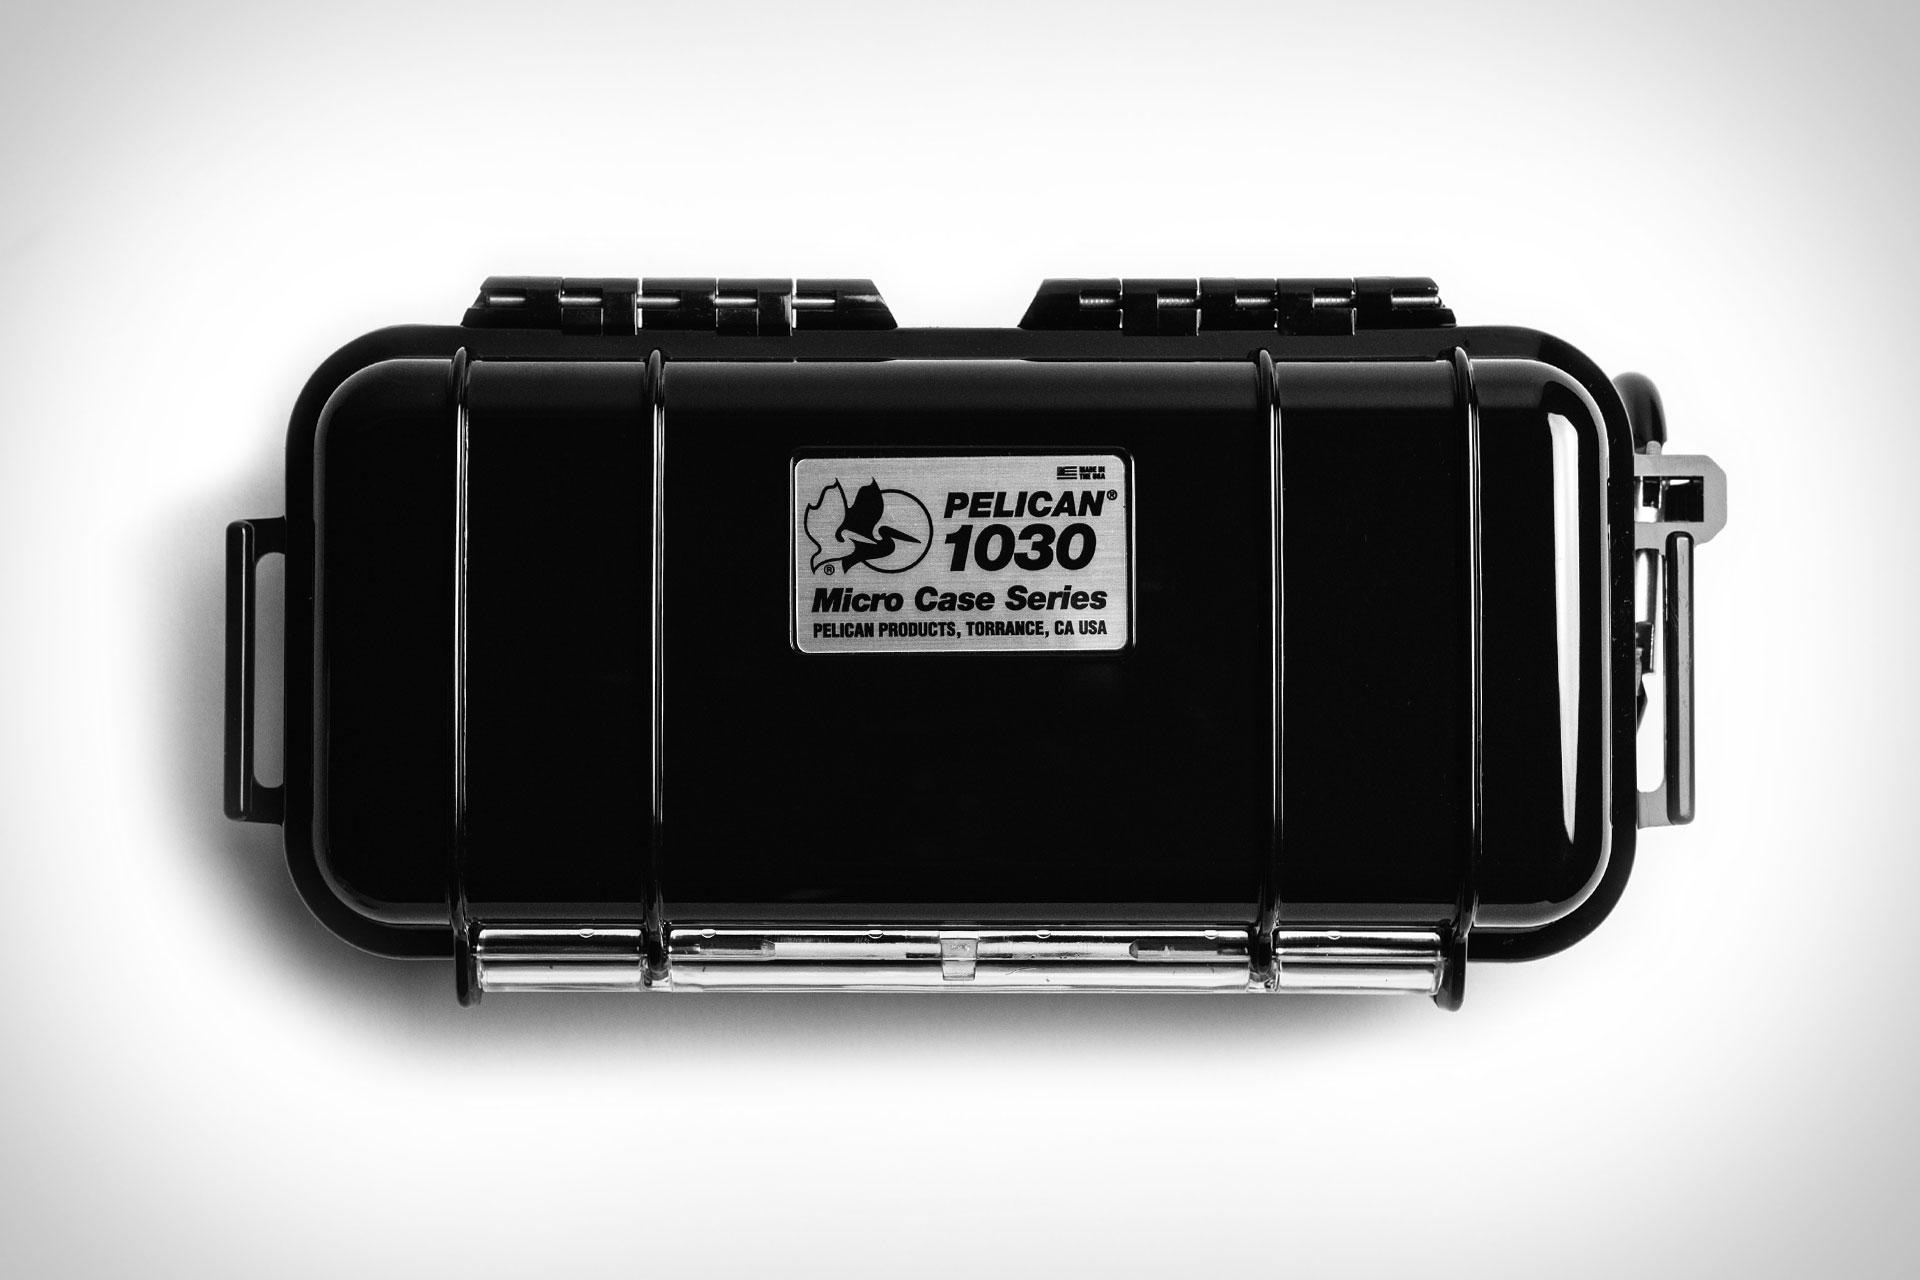 Pelican Mini Dry Box